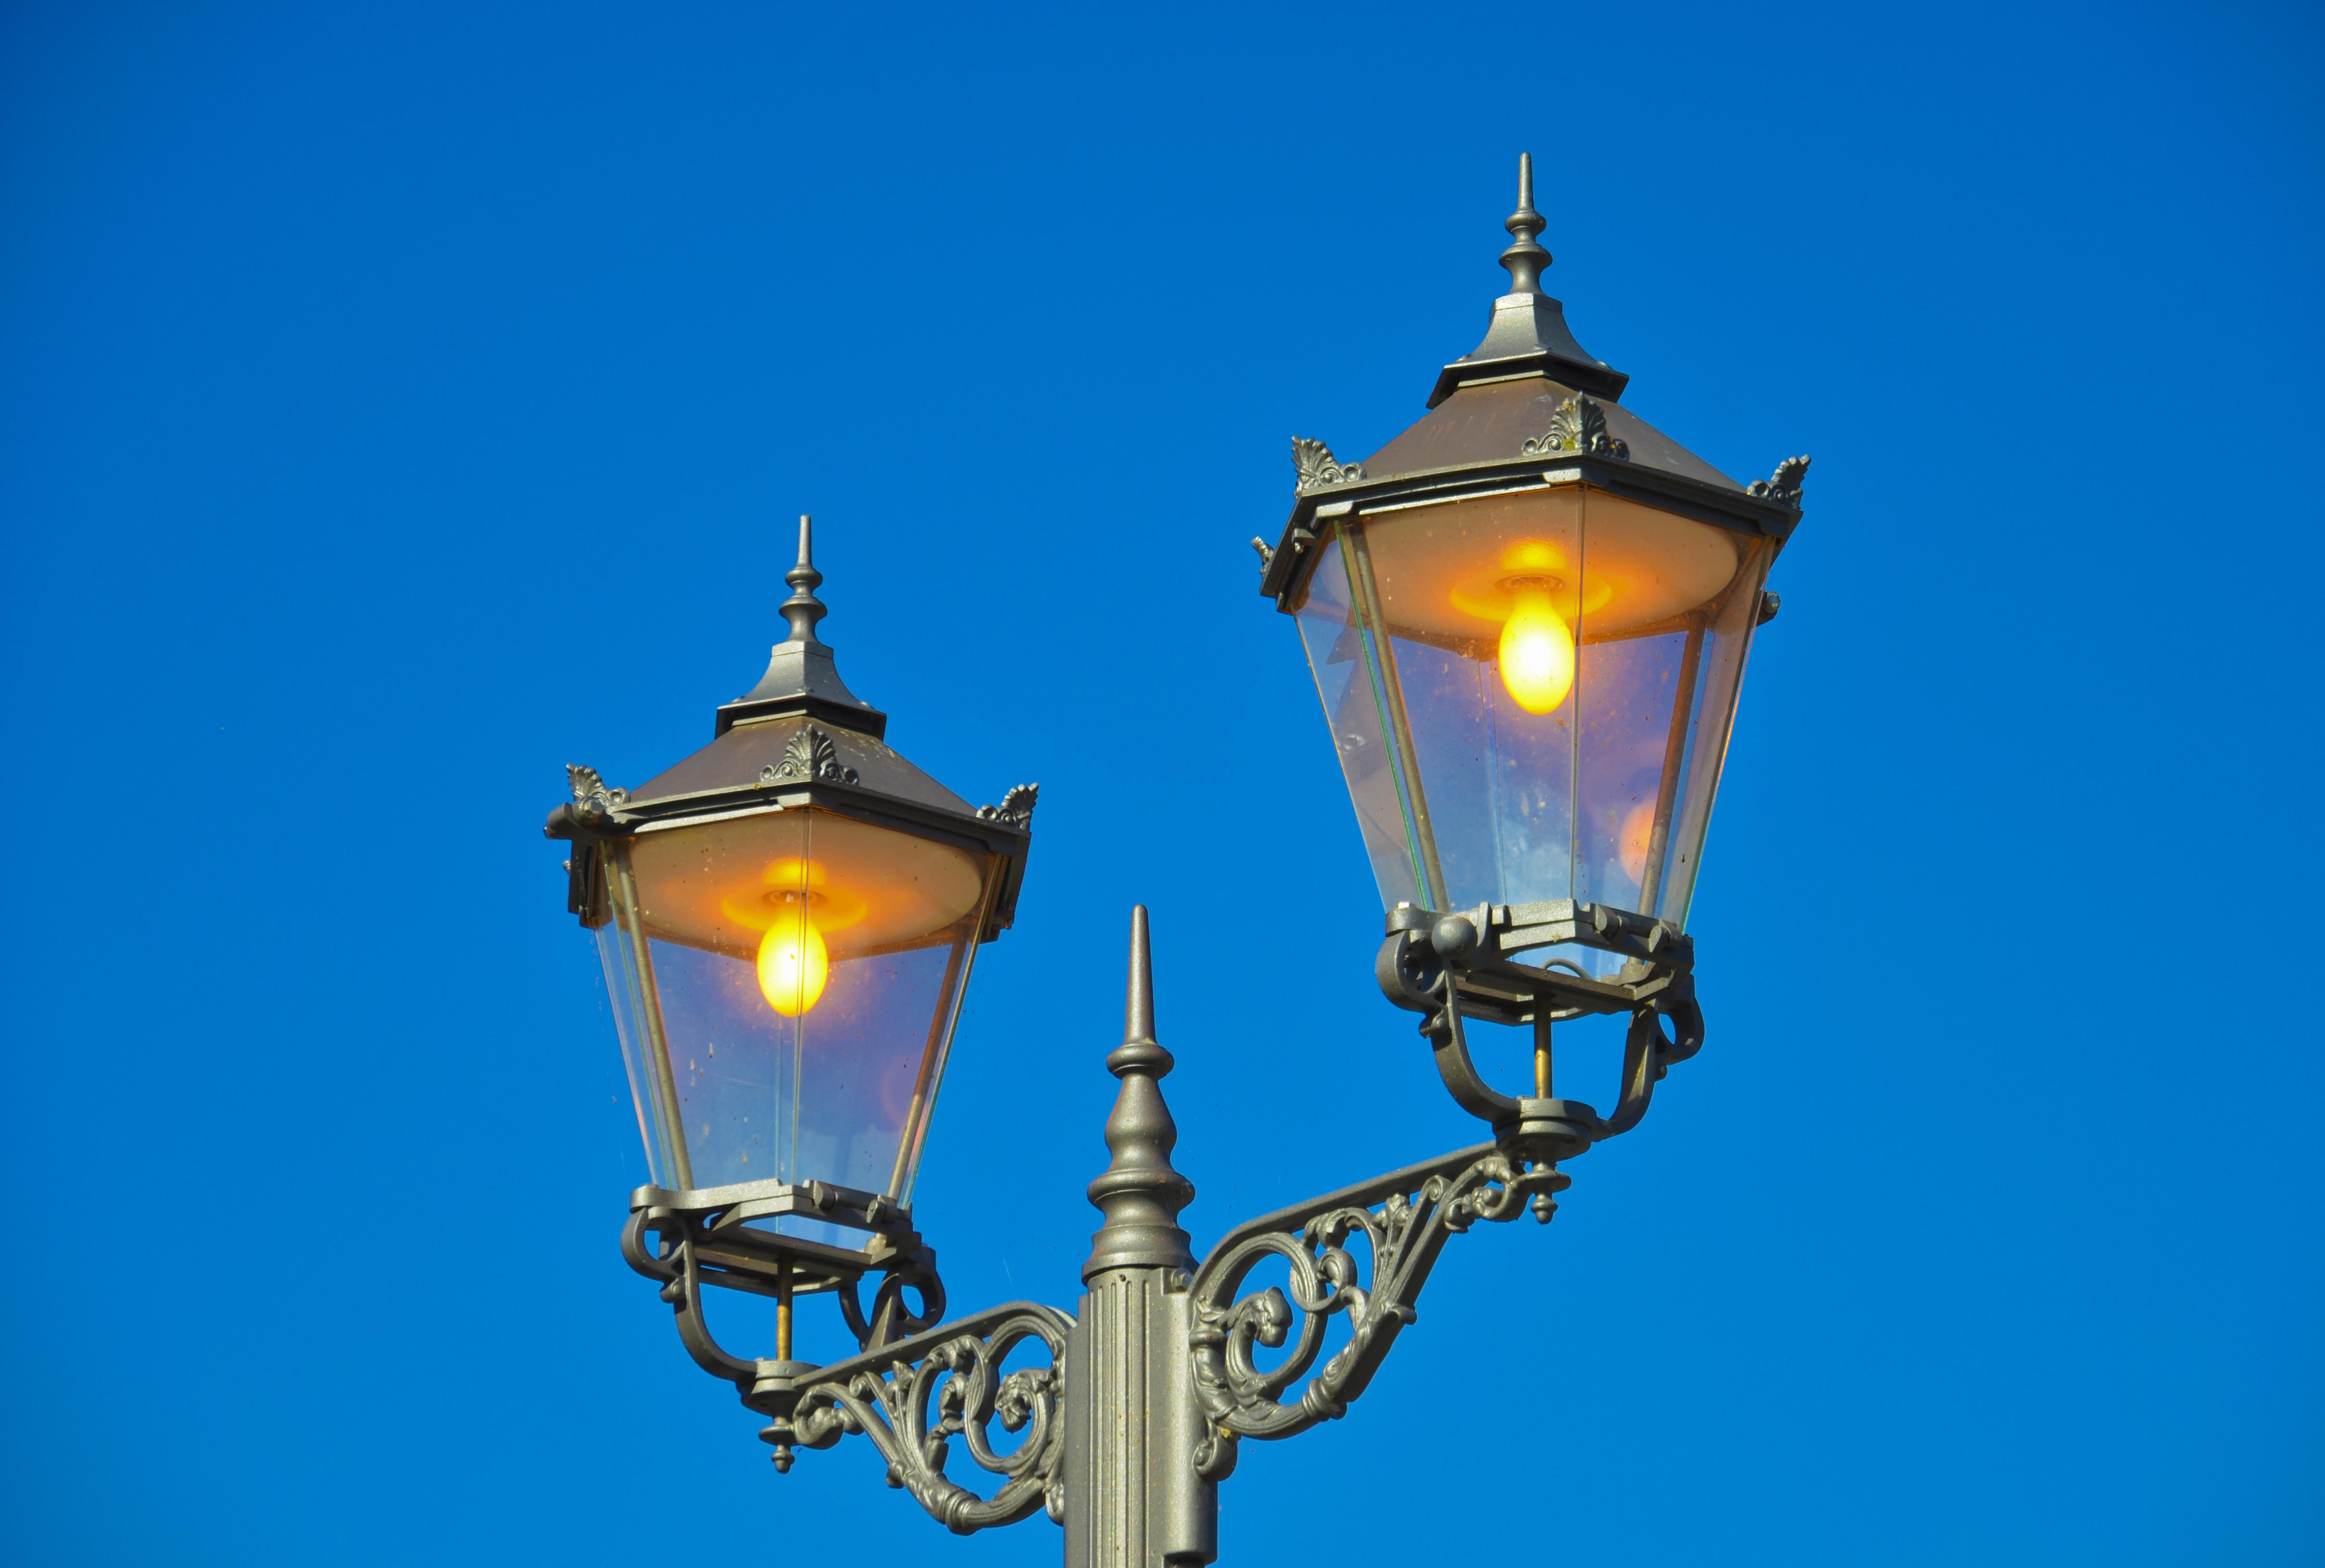 Old Oil Lamps Warisan Lighting